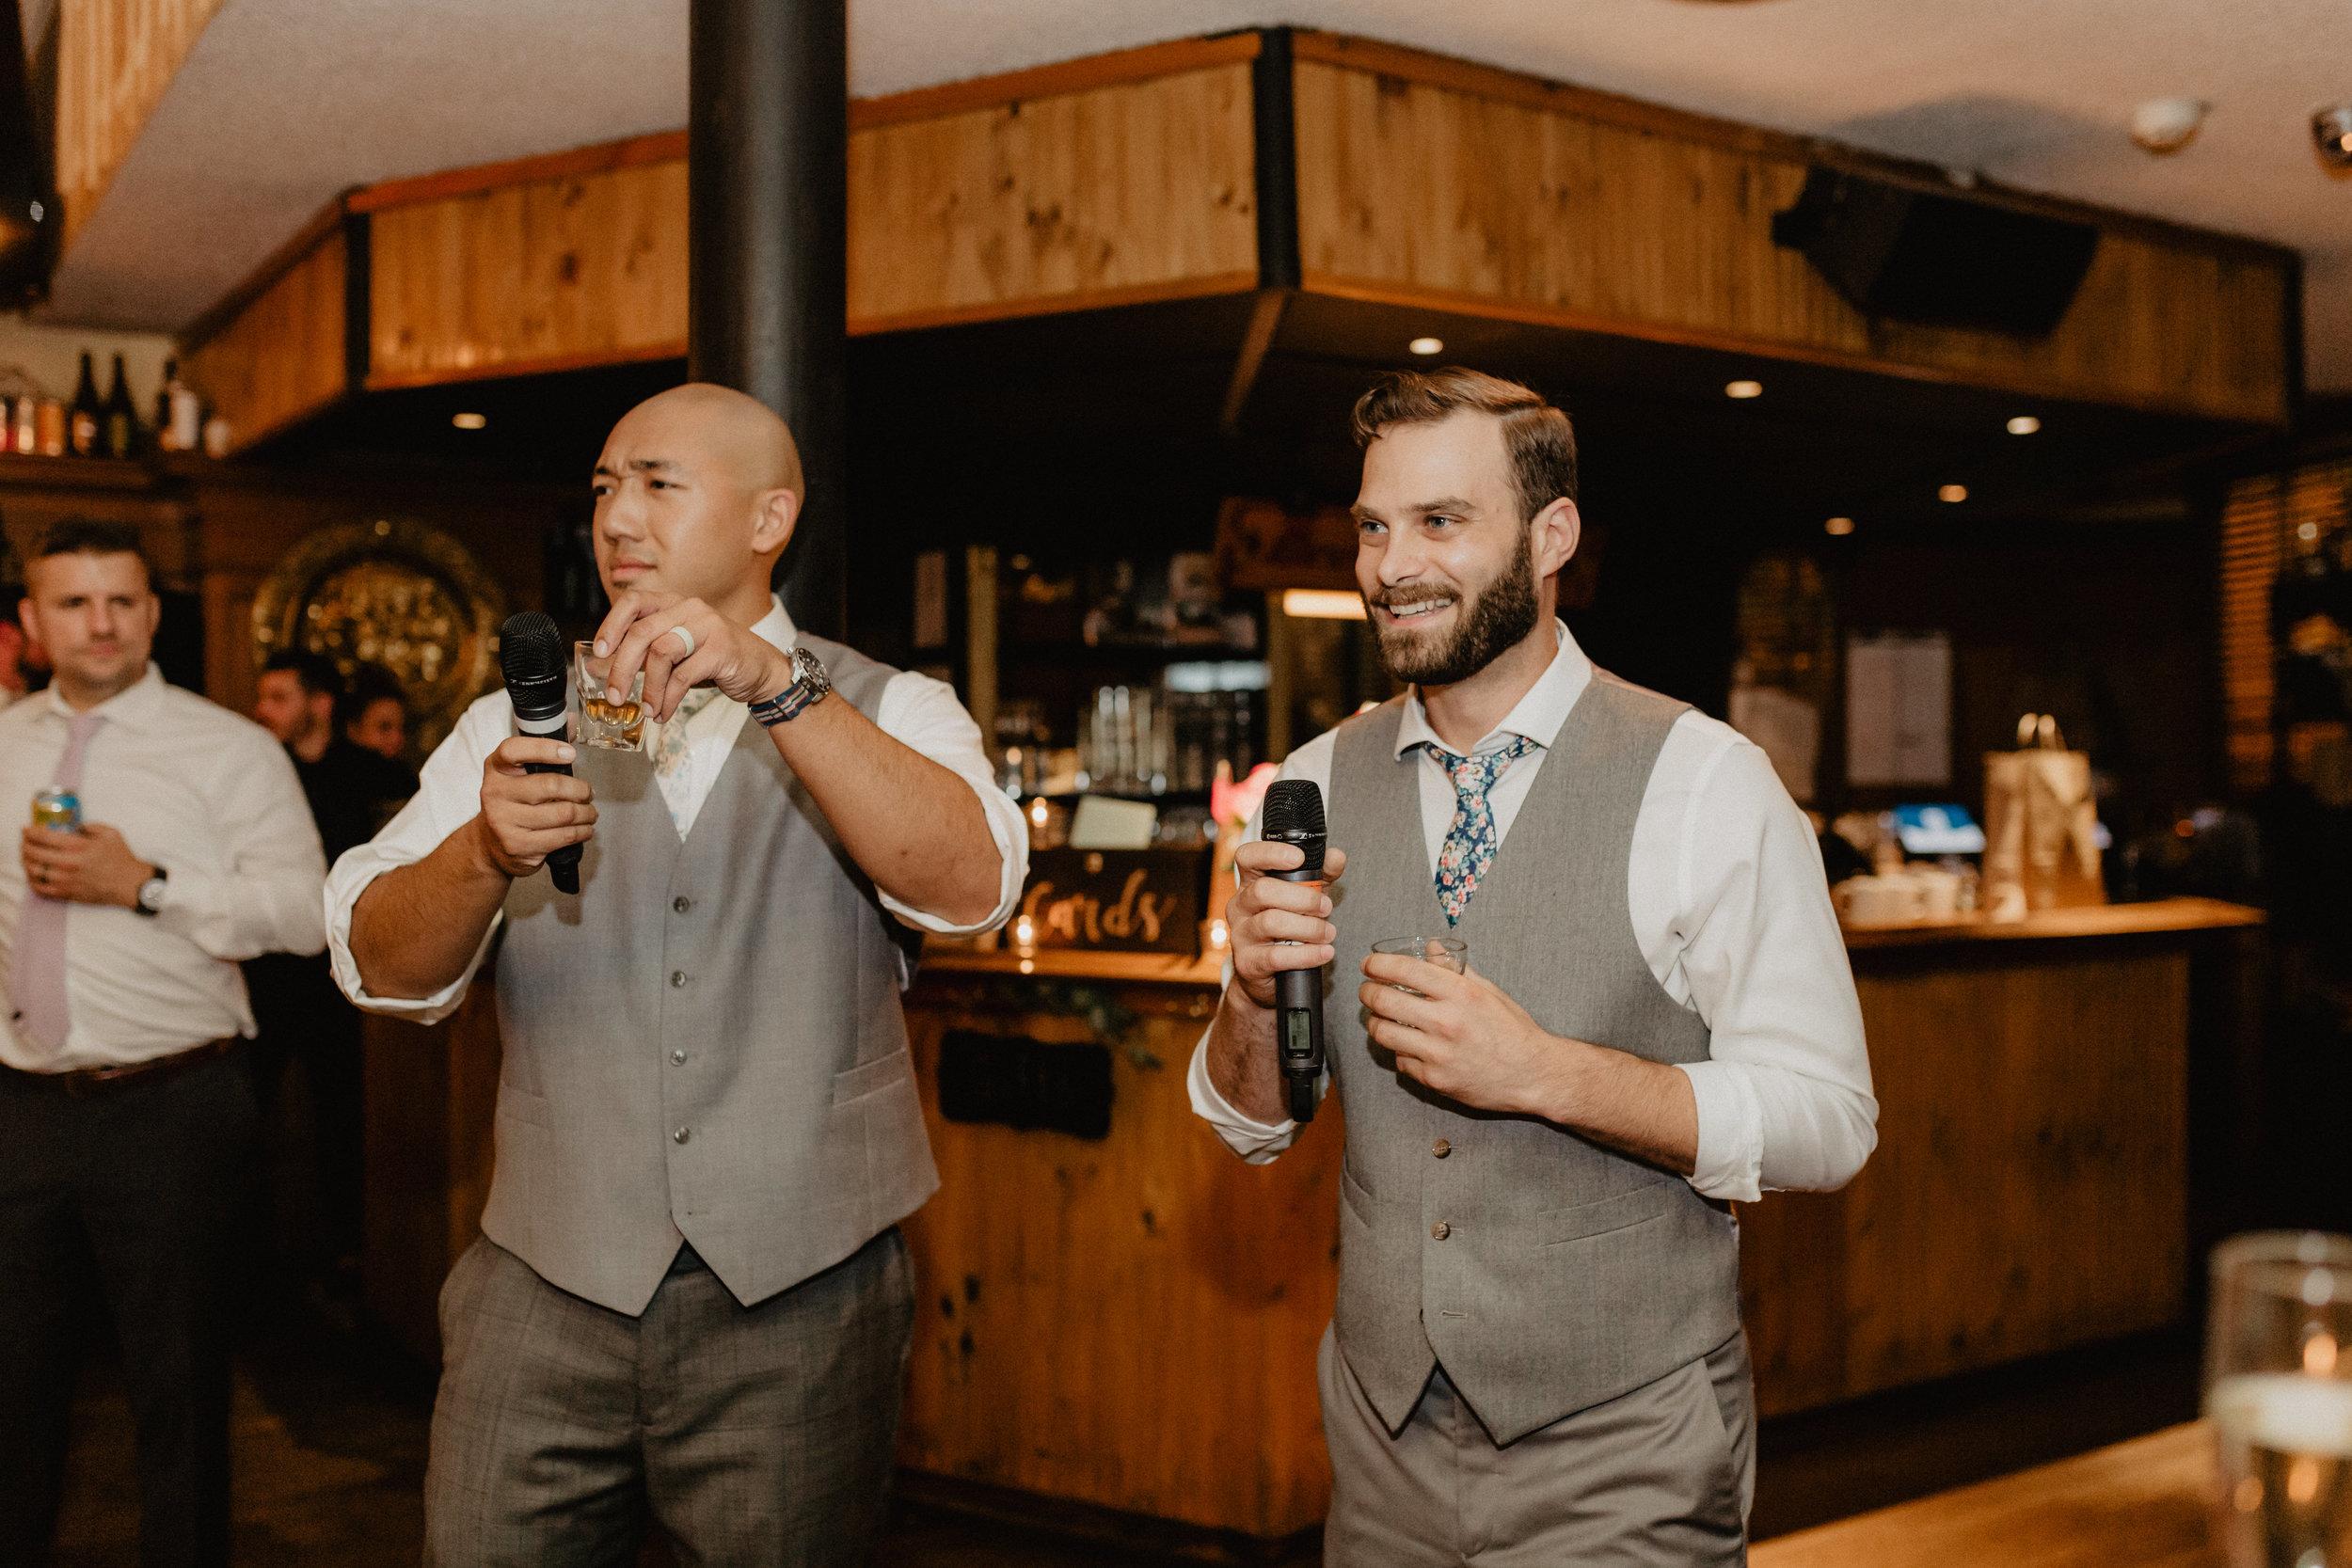 city-beer-hall-wedding-117.jpg